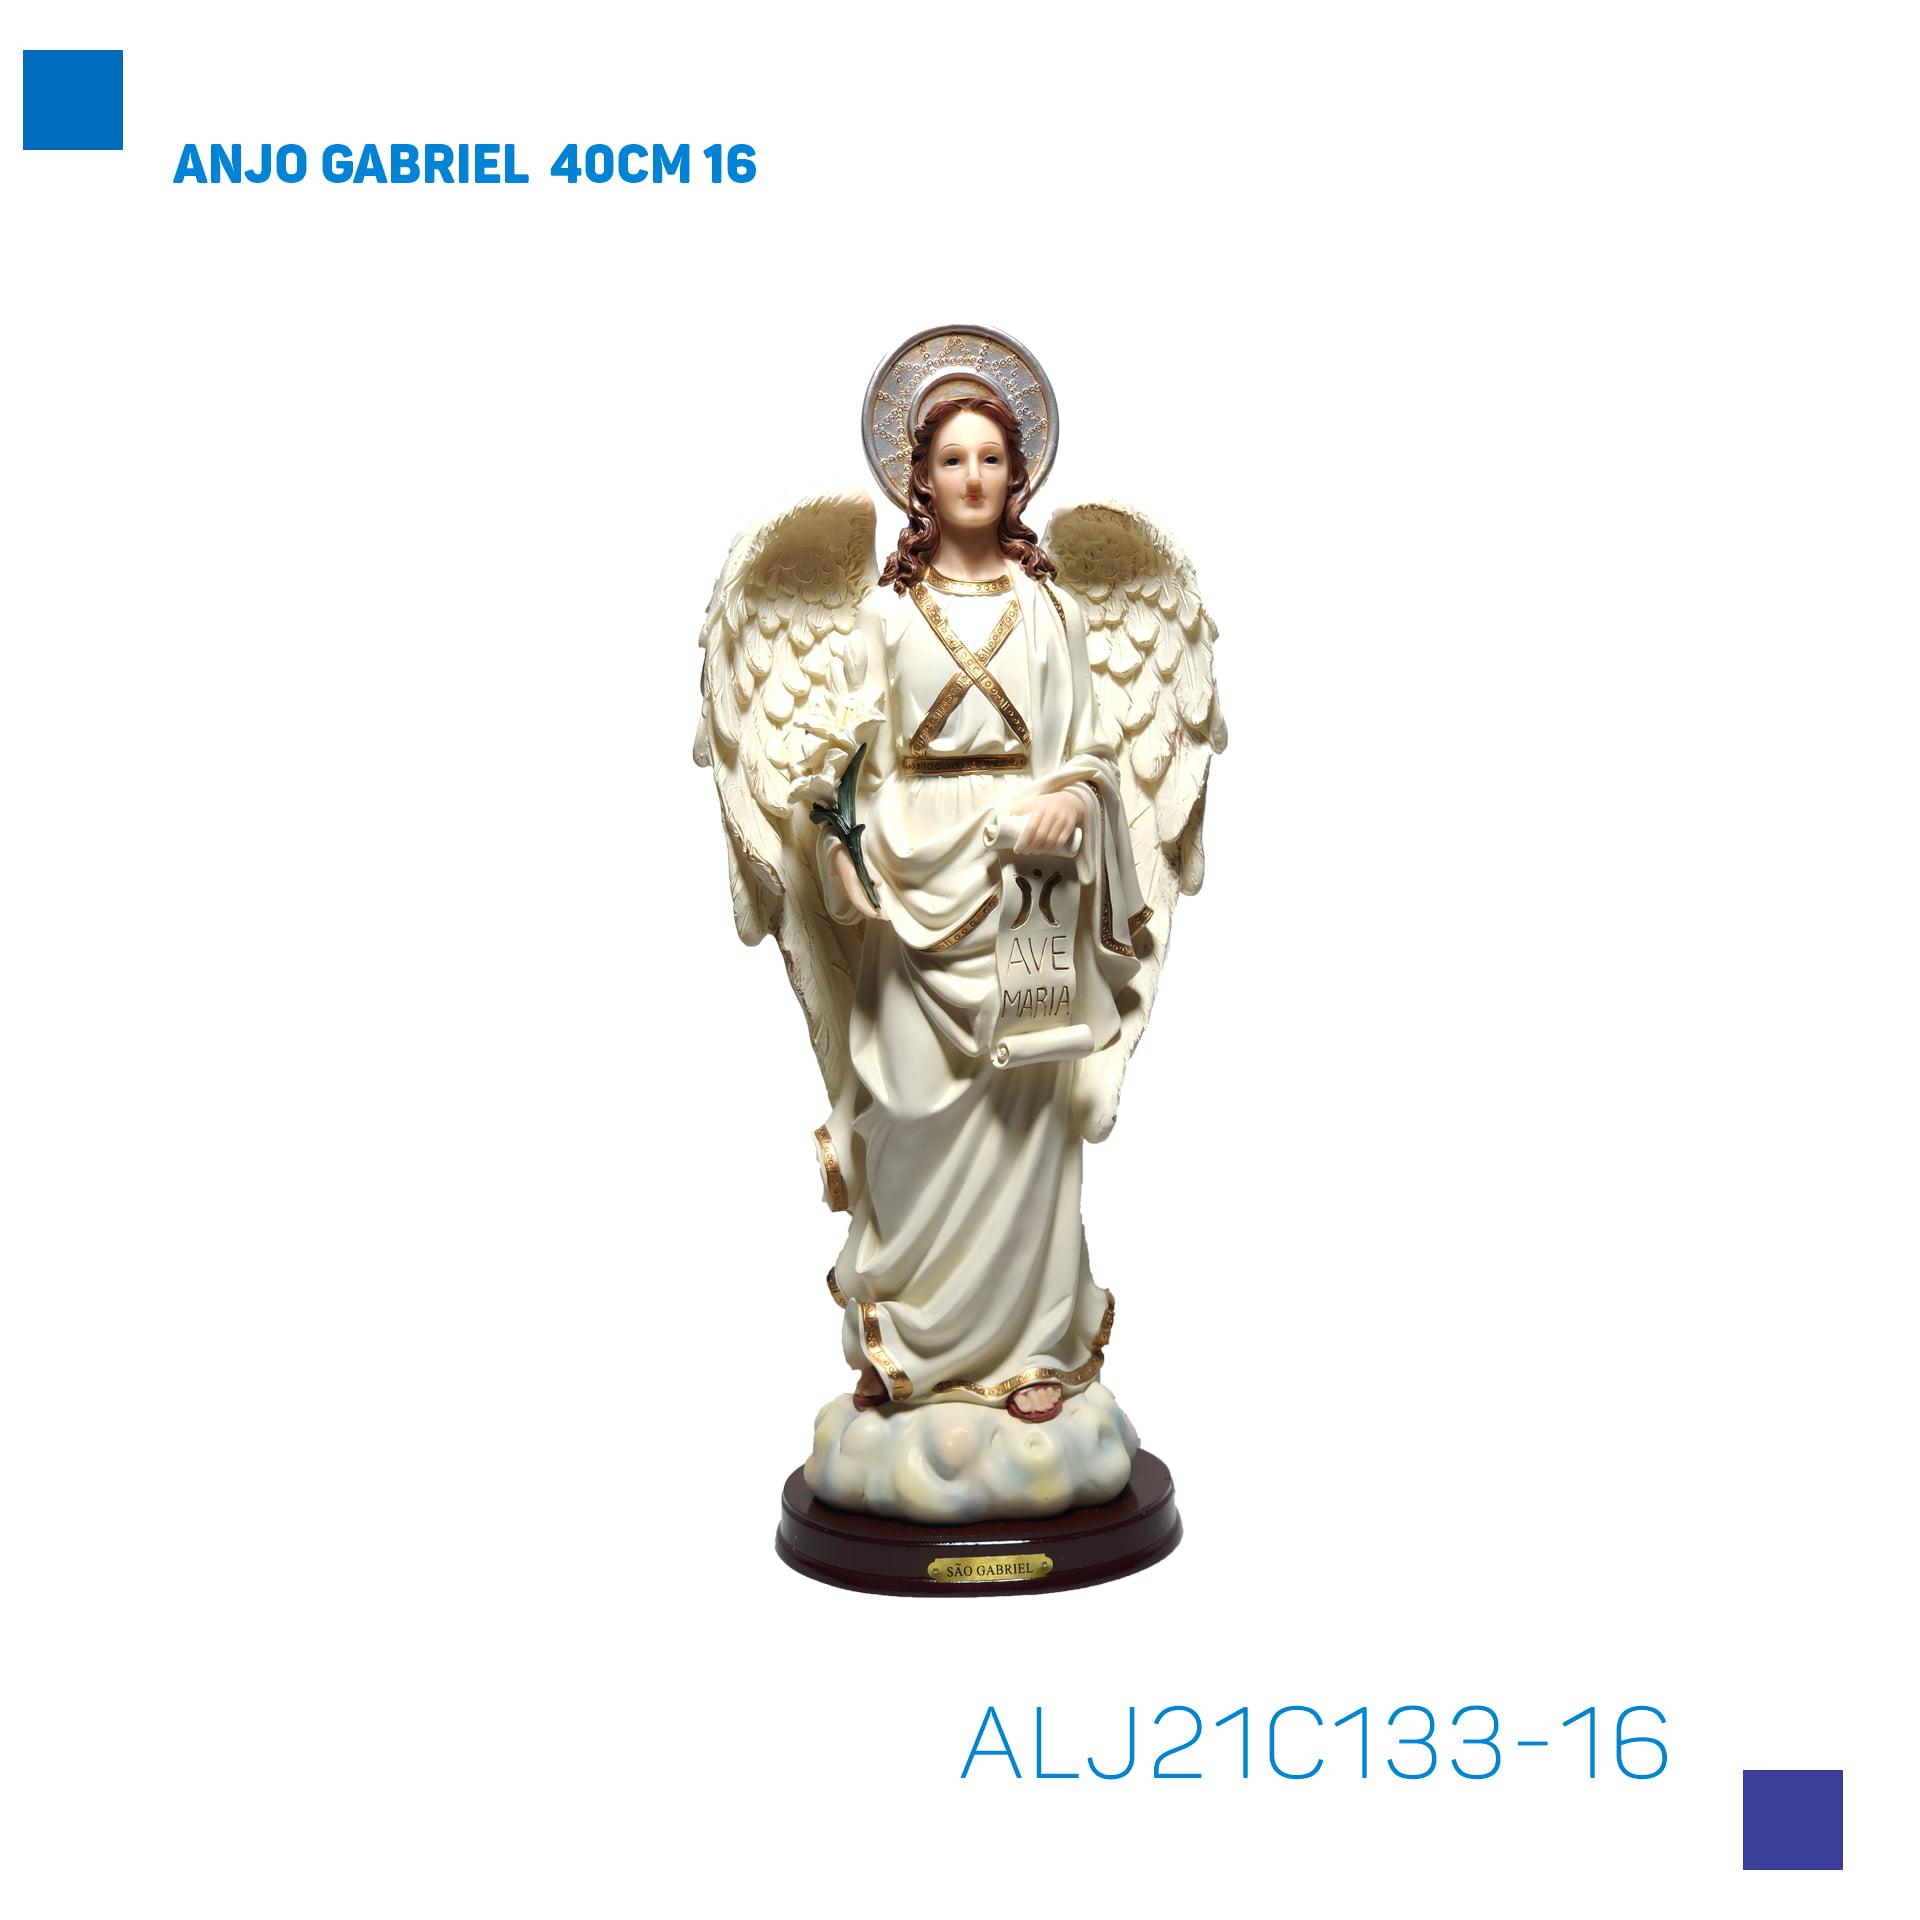 Bira Artigos Religiosos - ANJO GABRIEL 40CM - Cód. ALJ21C133-16